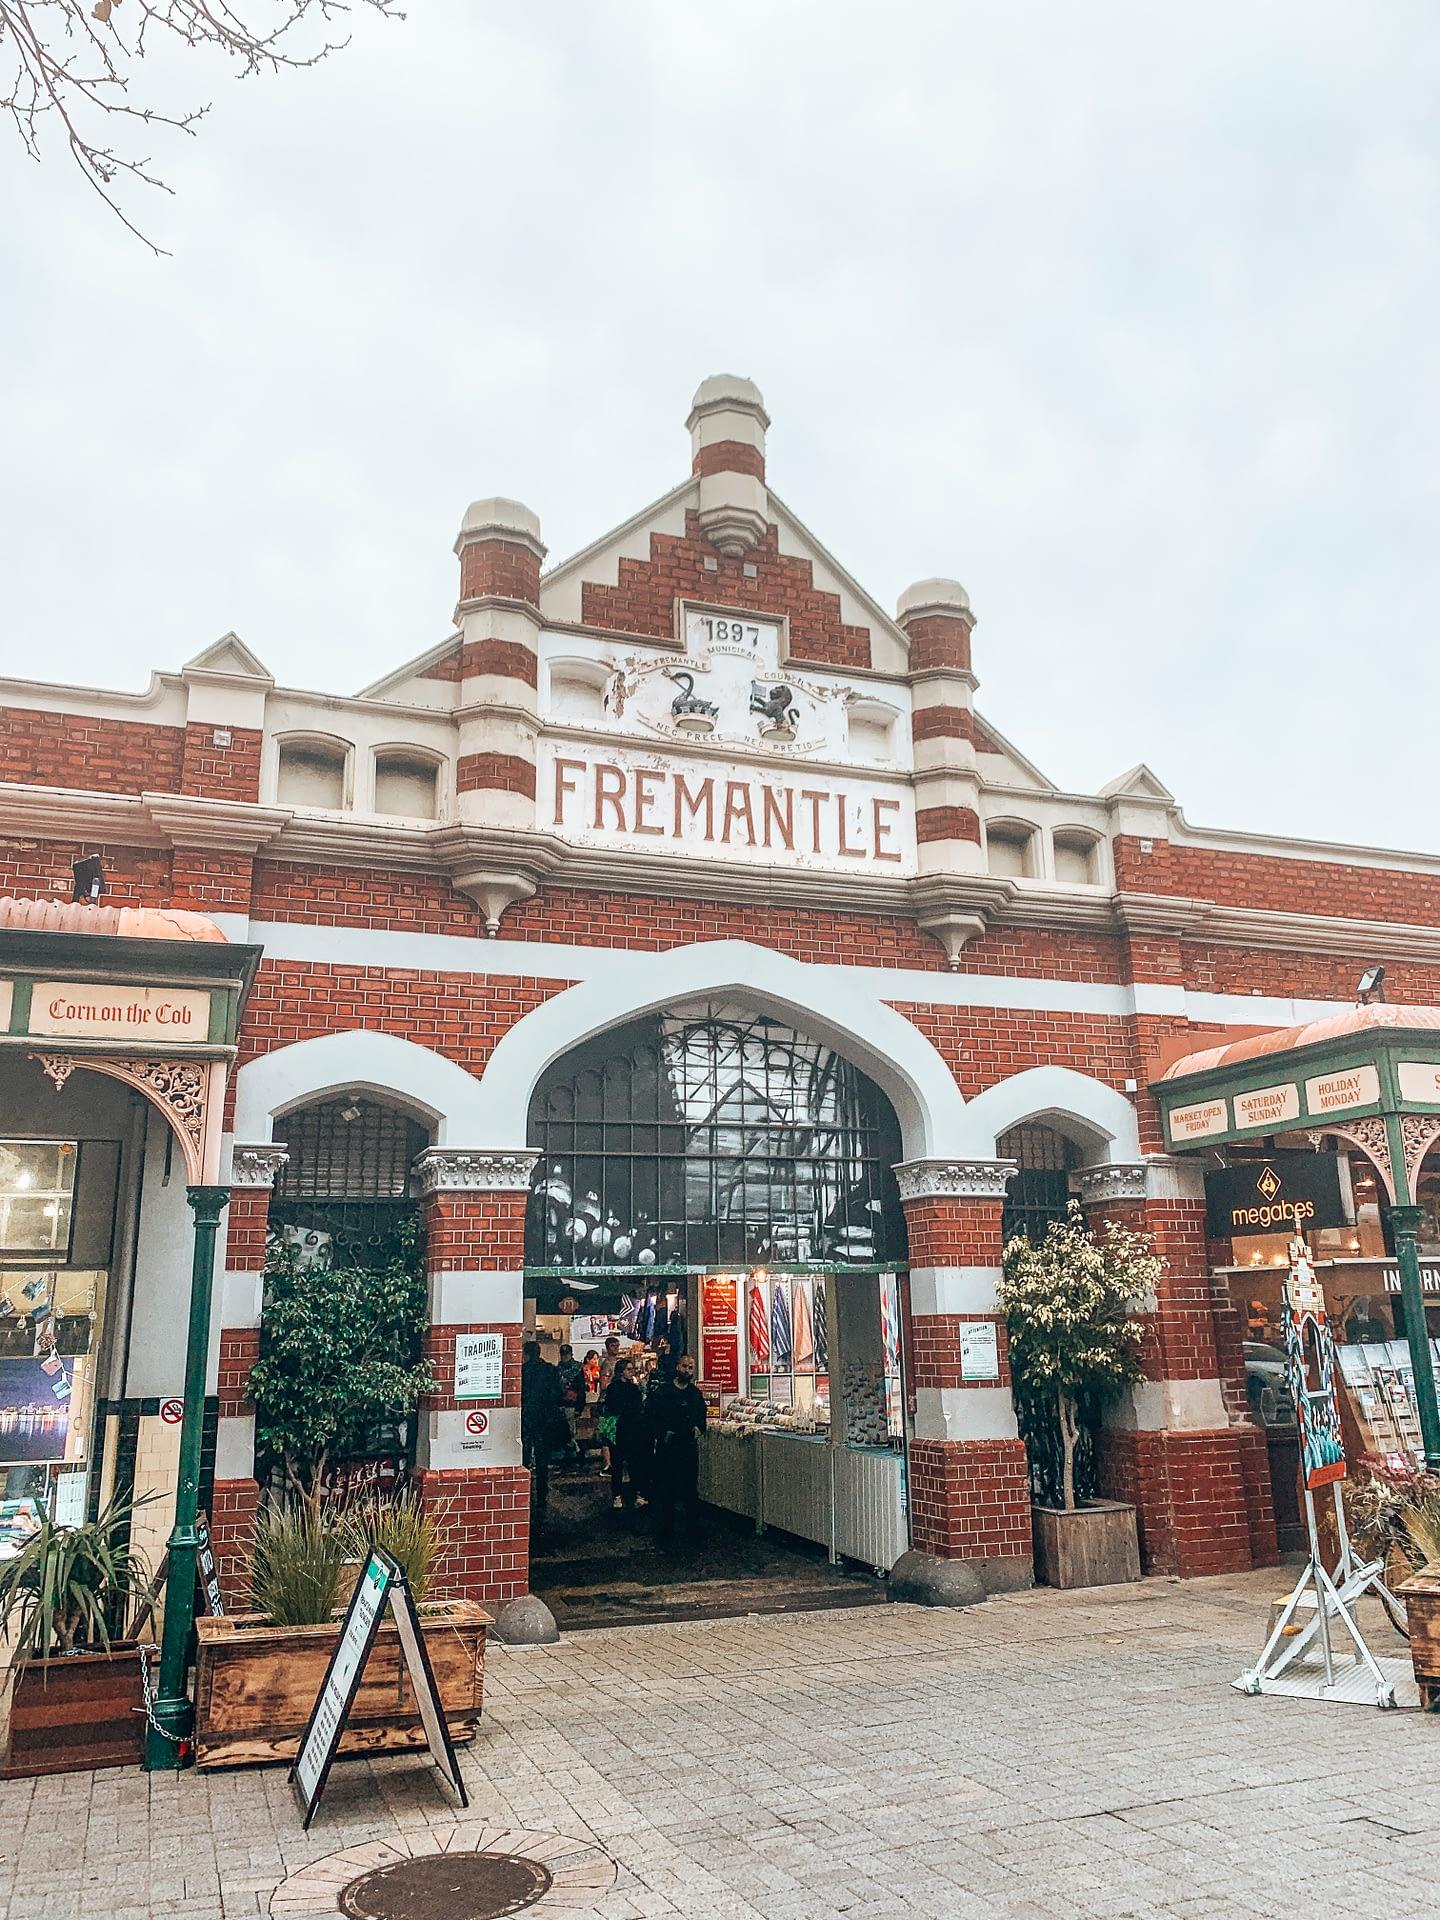 Fremantle Markets Perth - Image showing grand door entrance